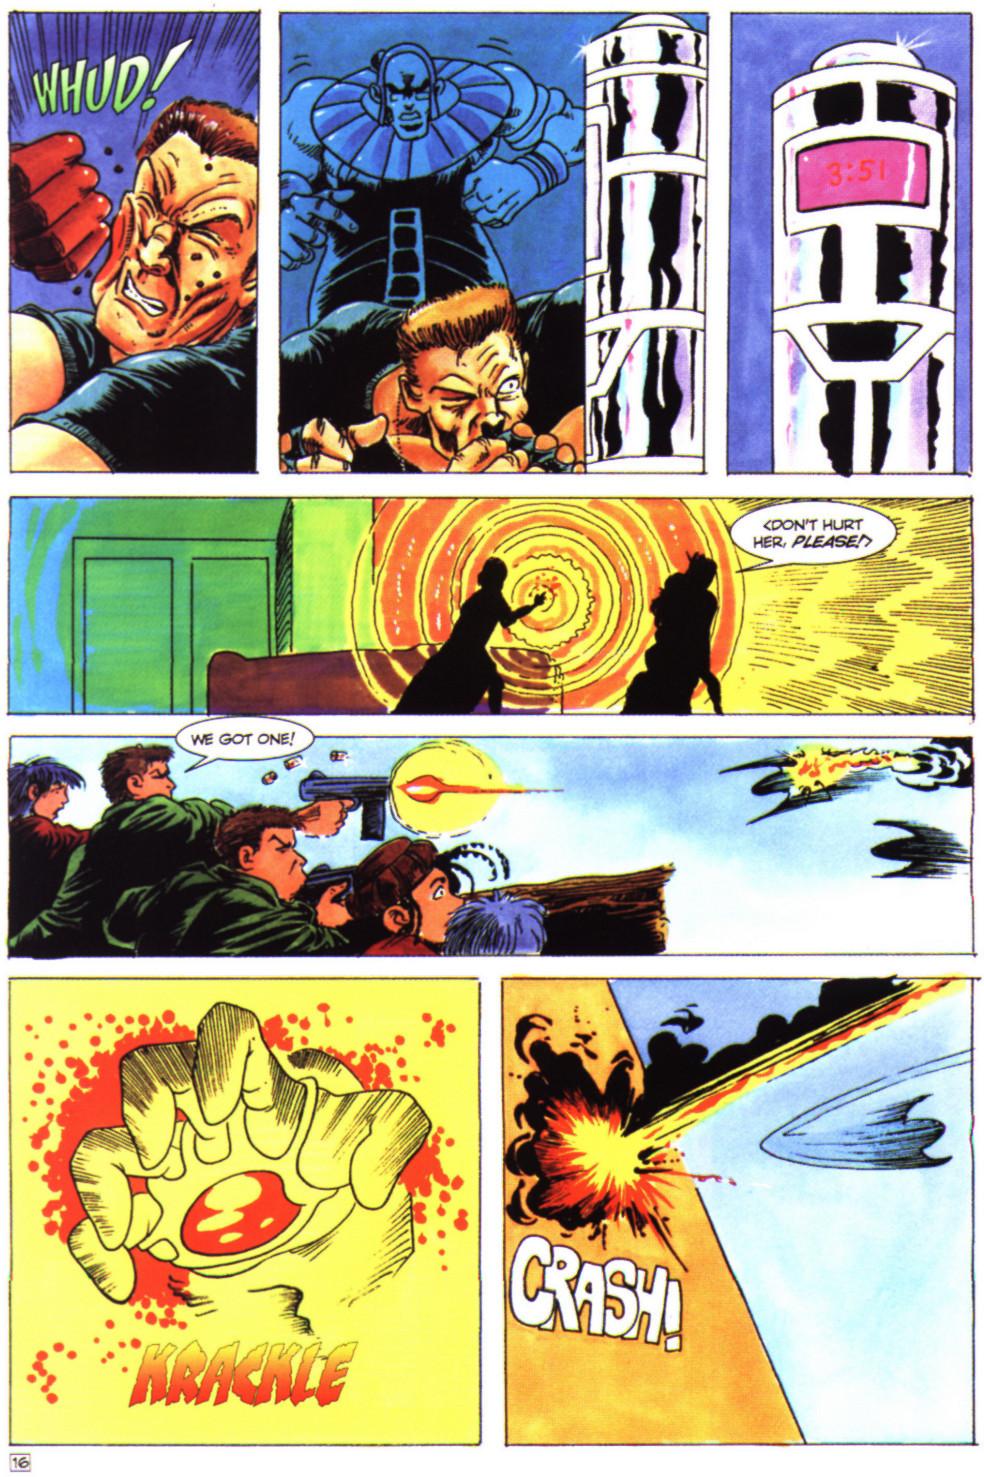 Read online Stargate comic -  Issue #4 - 18